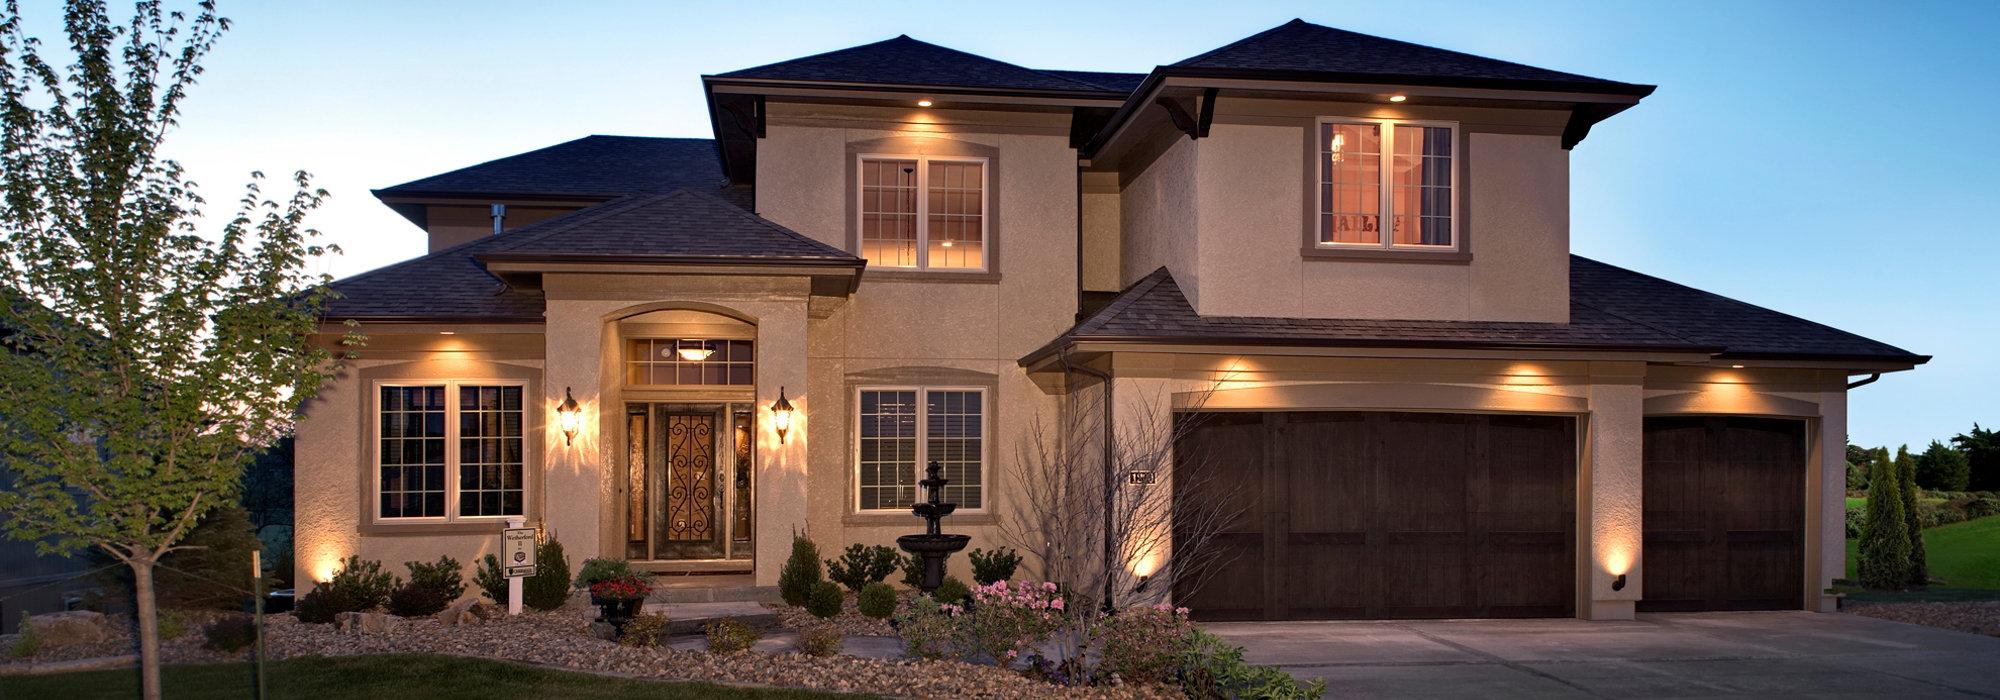 Envision Real Estate Homes For Sale In Garden City Kansas